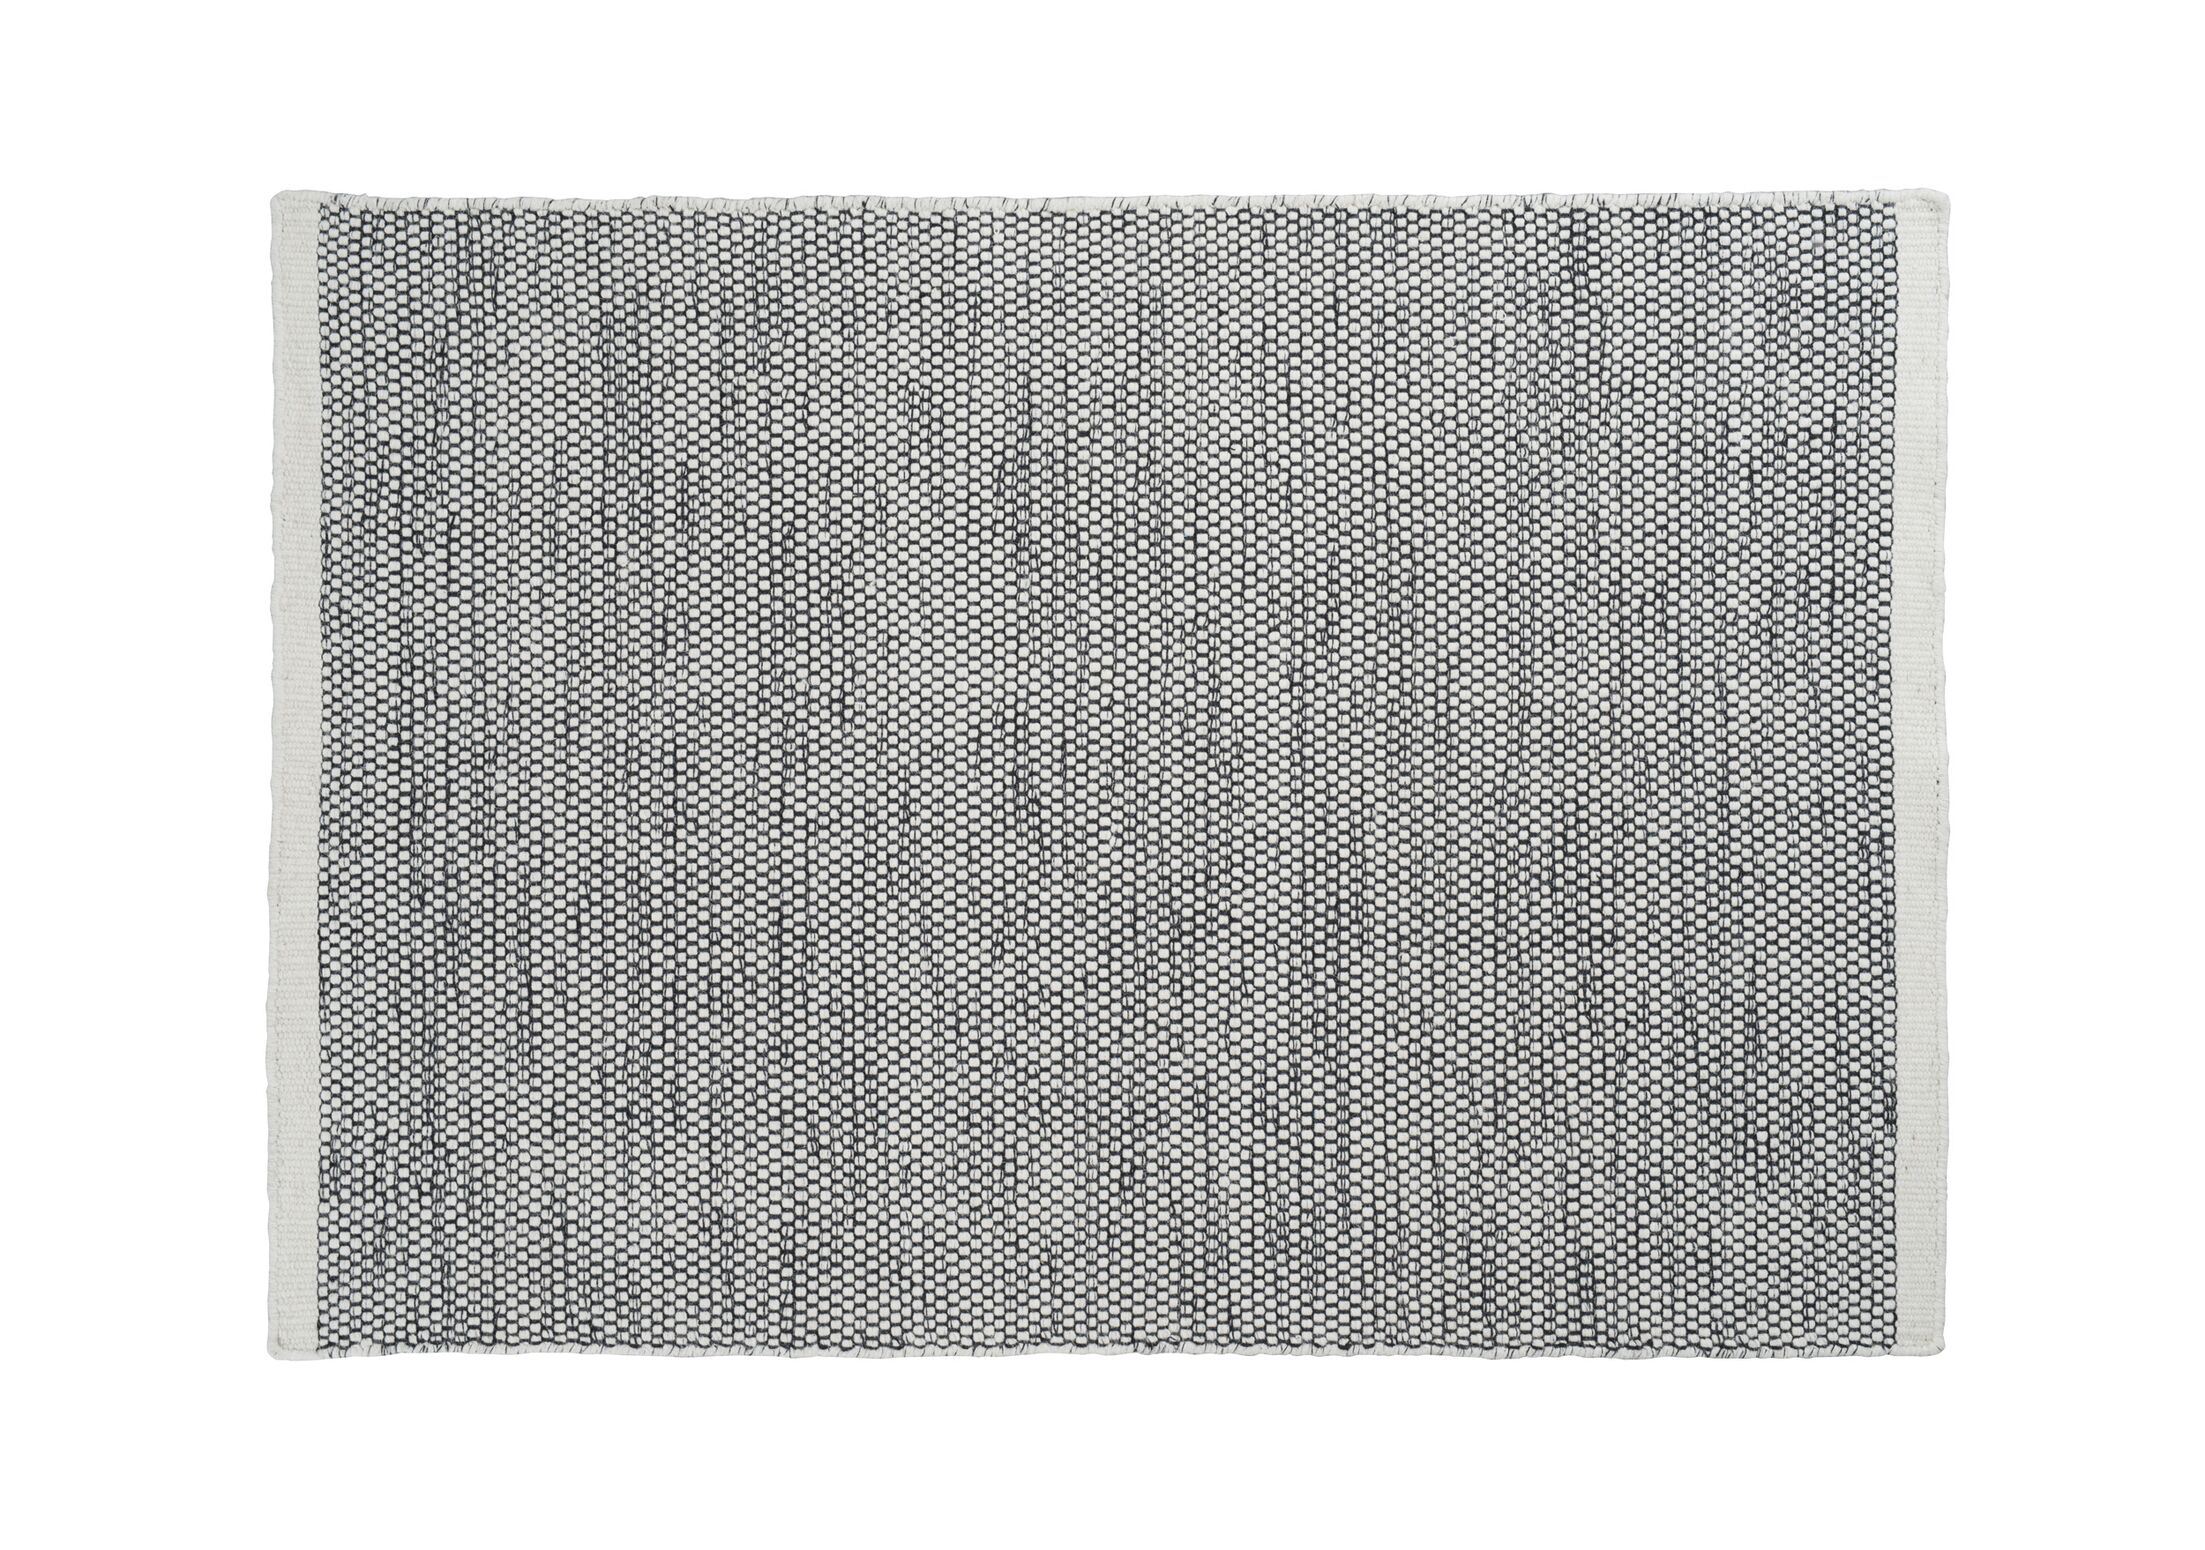 Mariya Hand Woven Wool Gray Area Rug Rug Size: 8'3